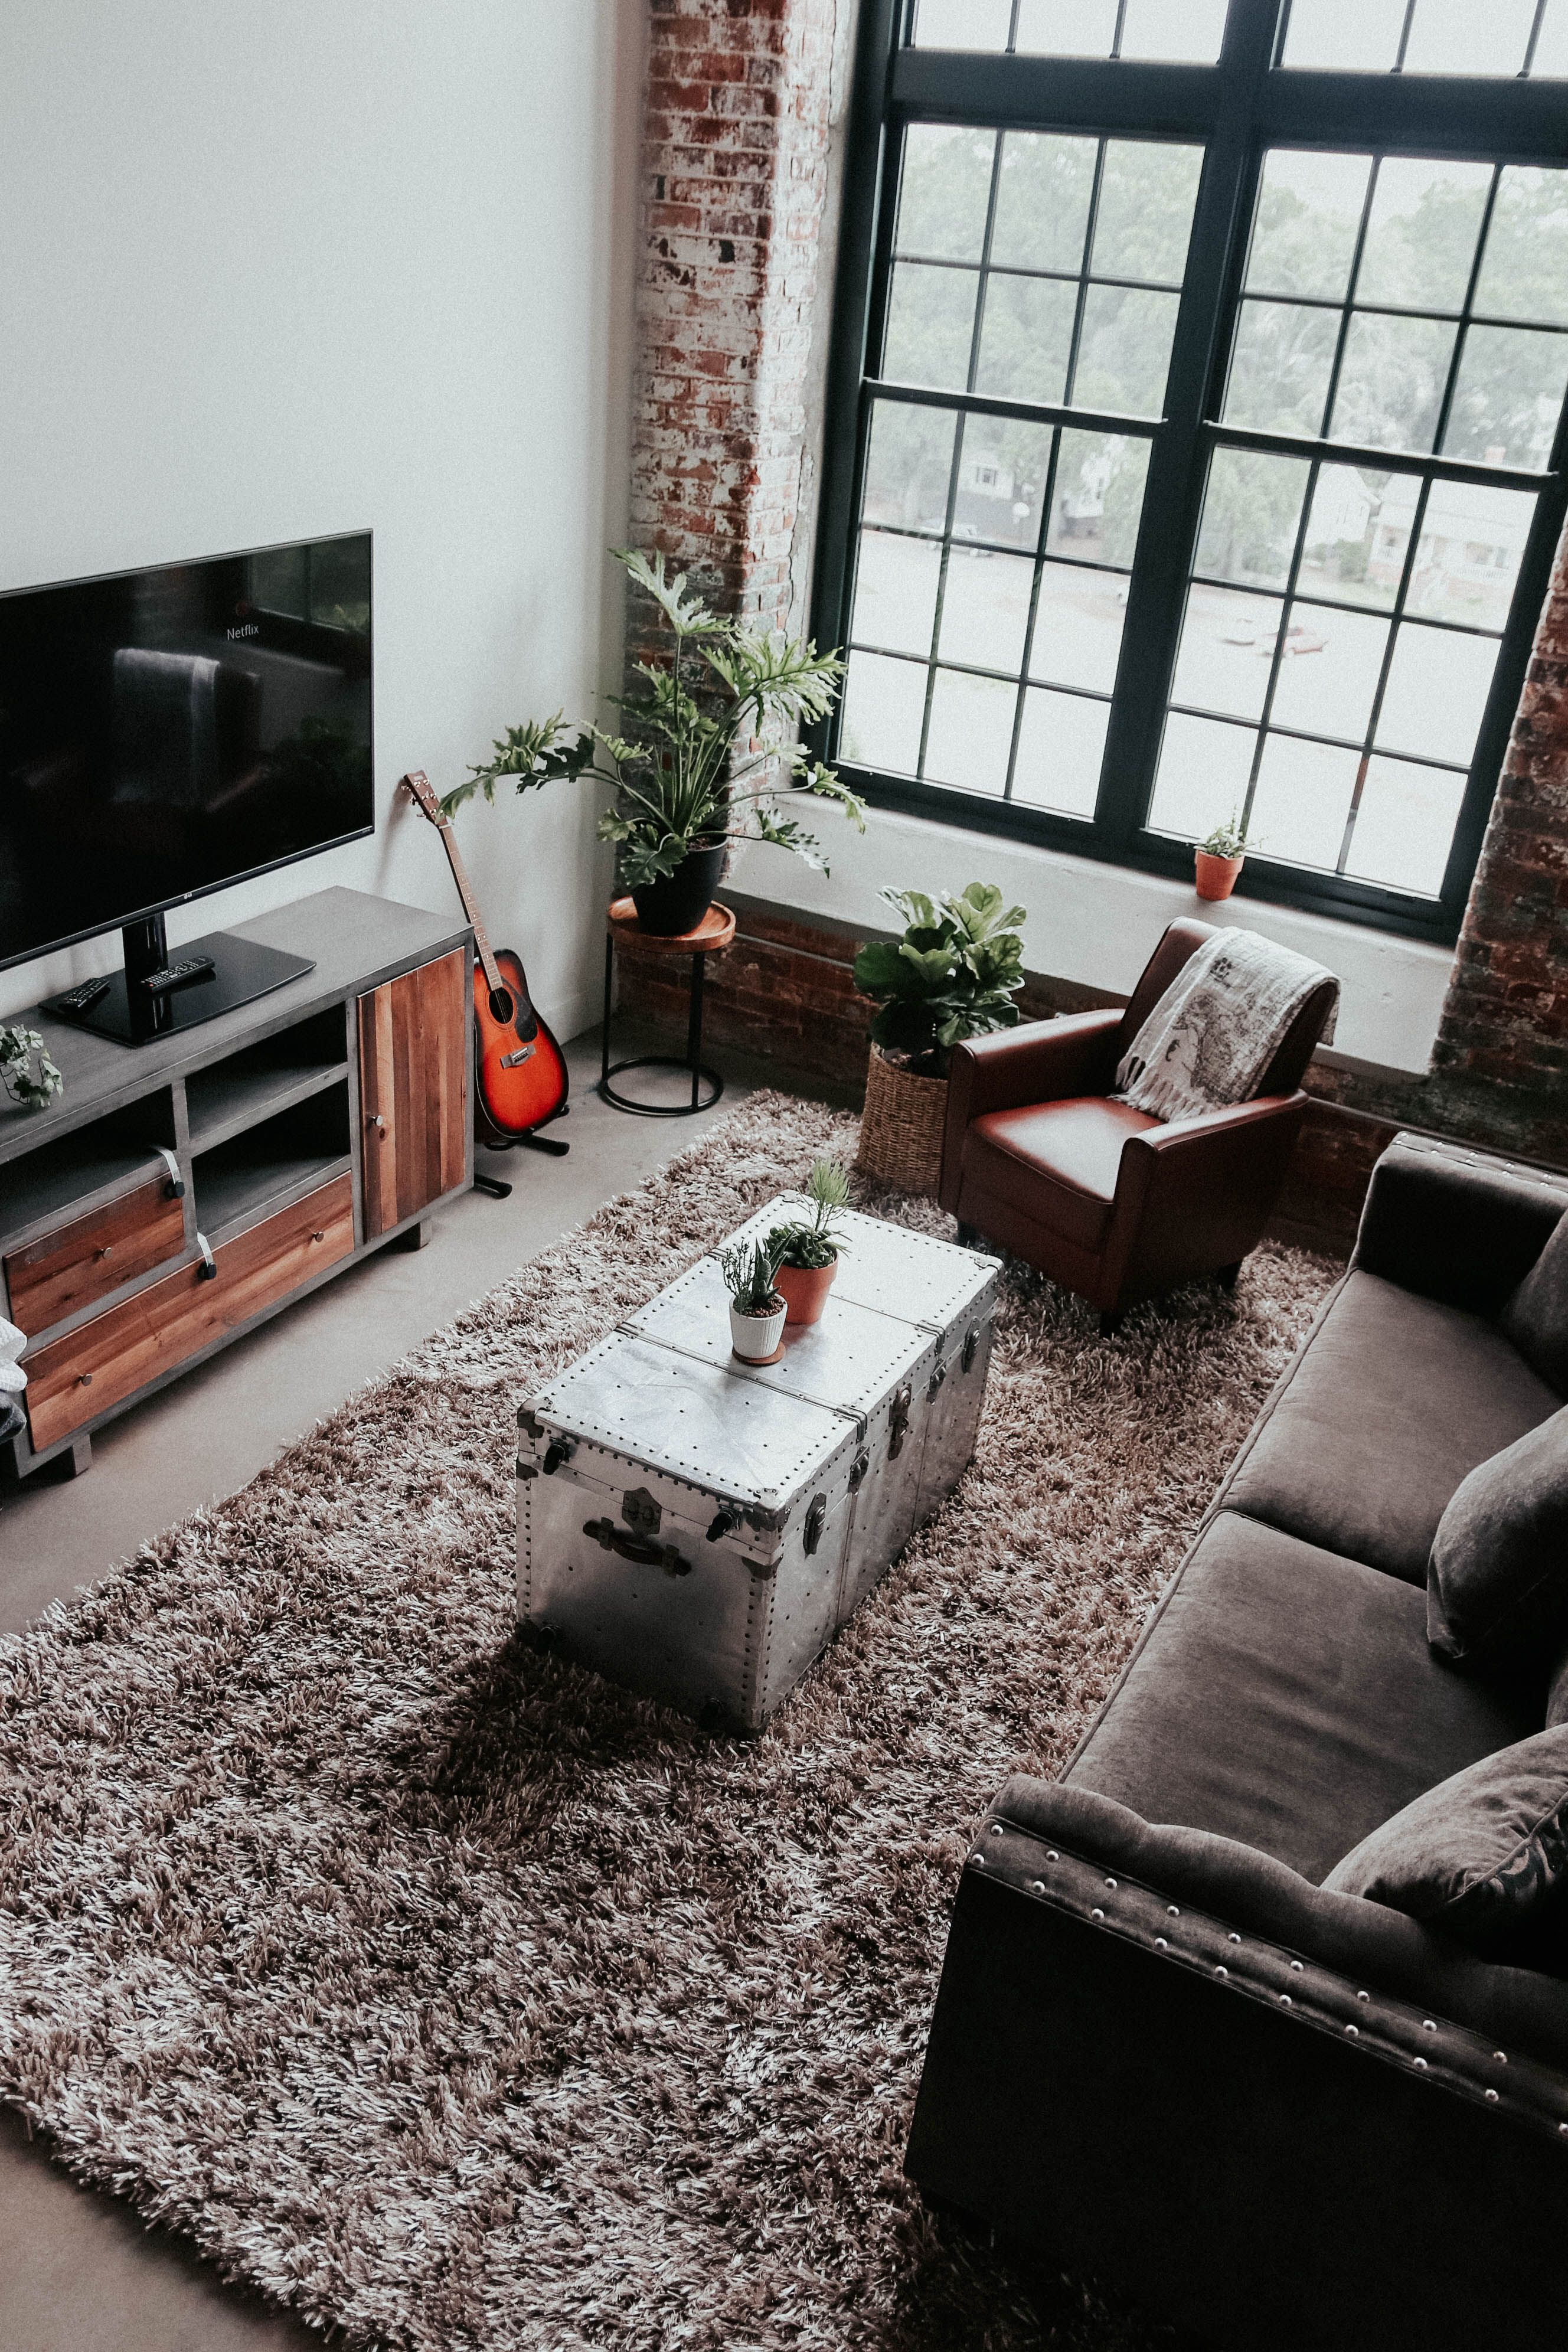 Modern Rustic Industrial Loft Apartment Industrial Apartment Decor Loft Decor Home Decor